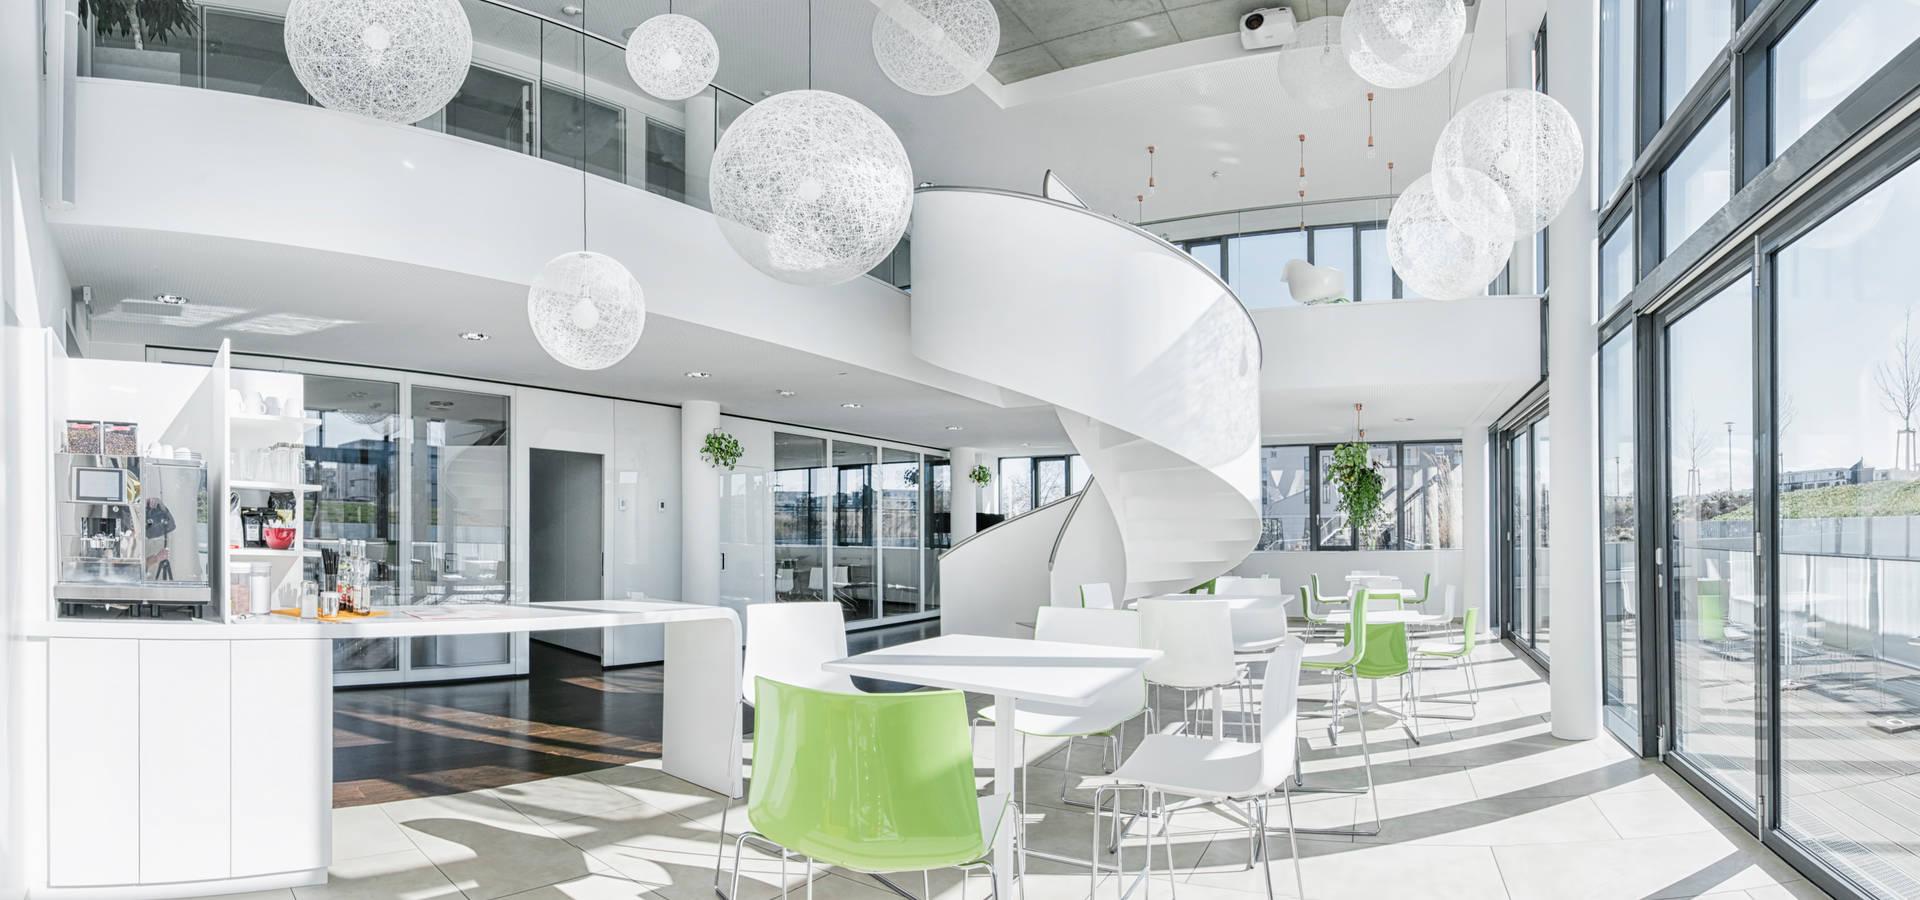 Kaldma Interiors – Interior Design aus Karlsruhe